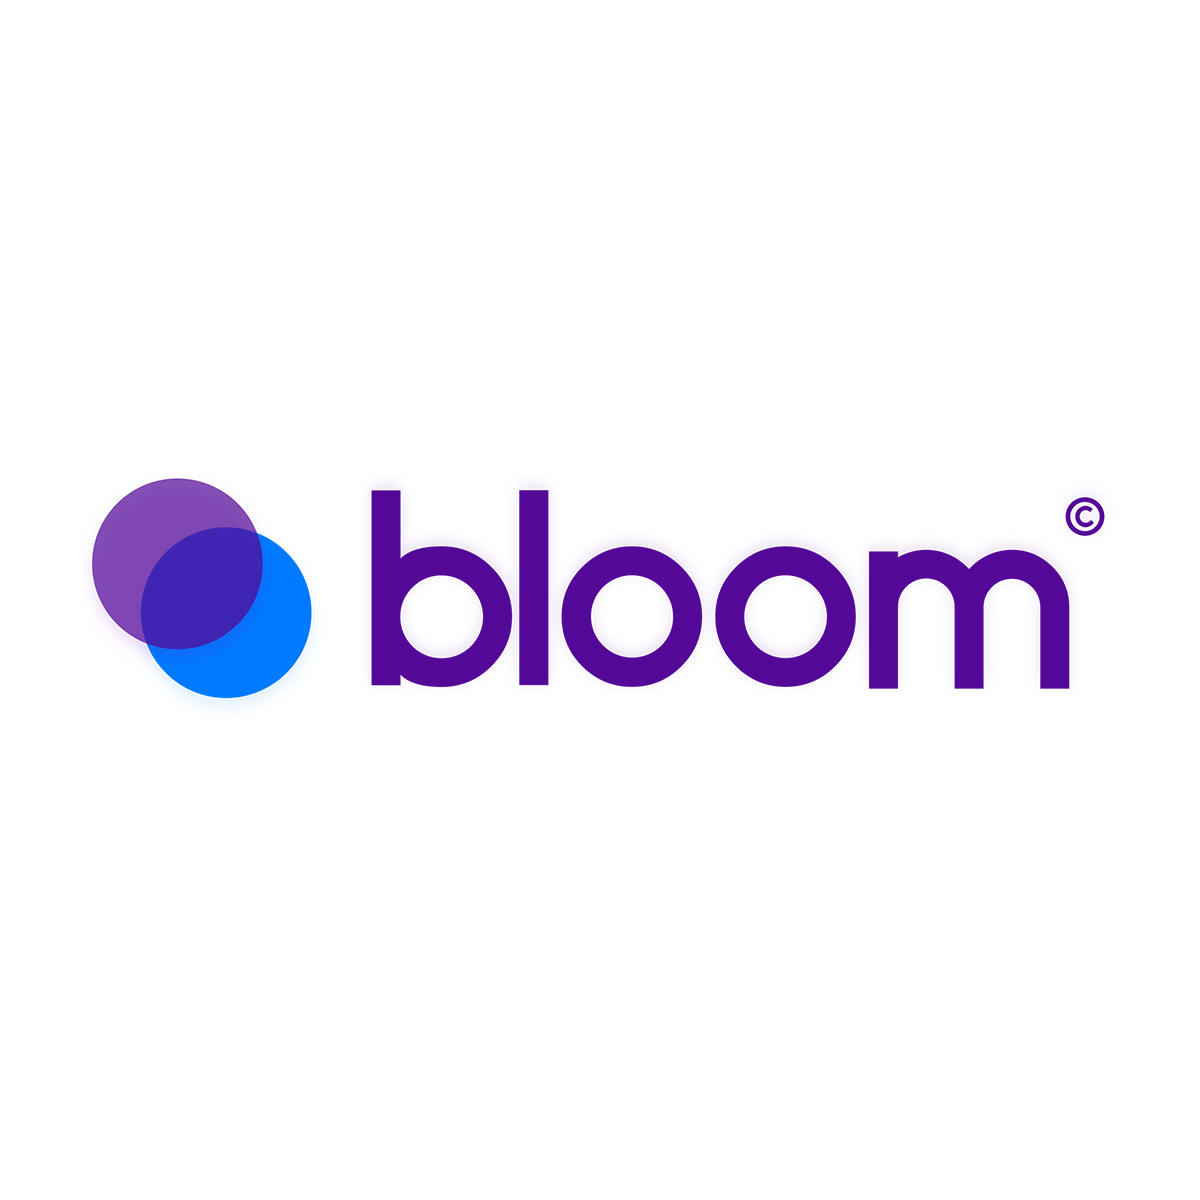 Bloom logo square.jpg